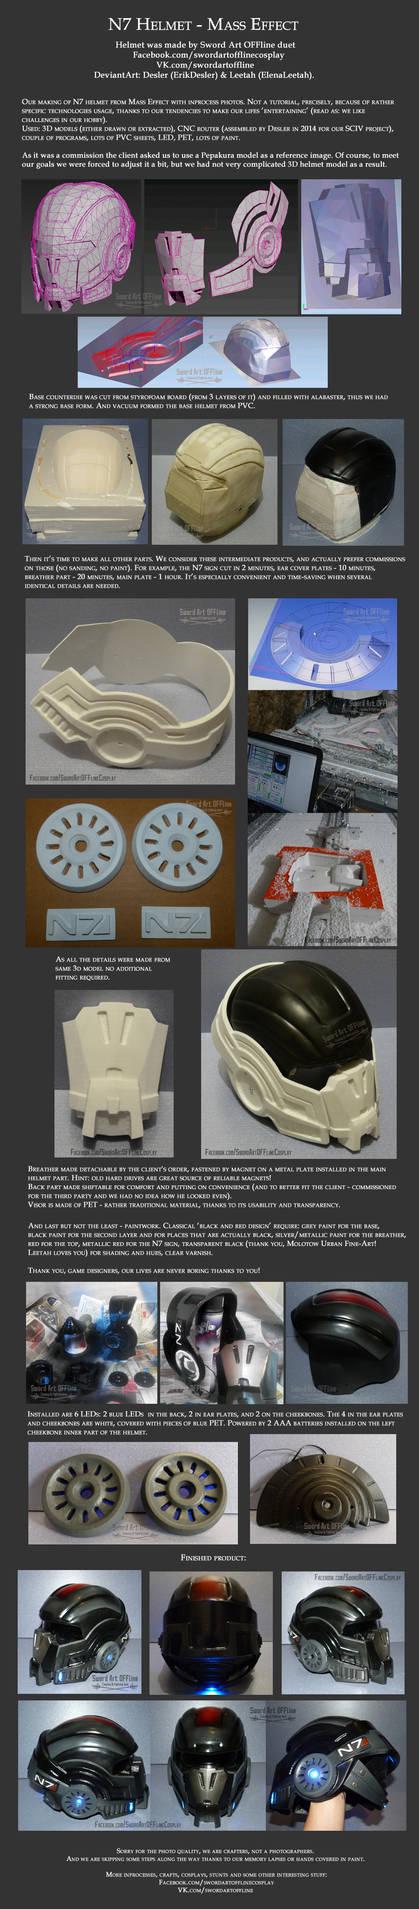 How it's made: N7 helmet - SAO duet craft